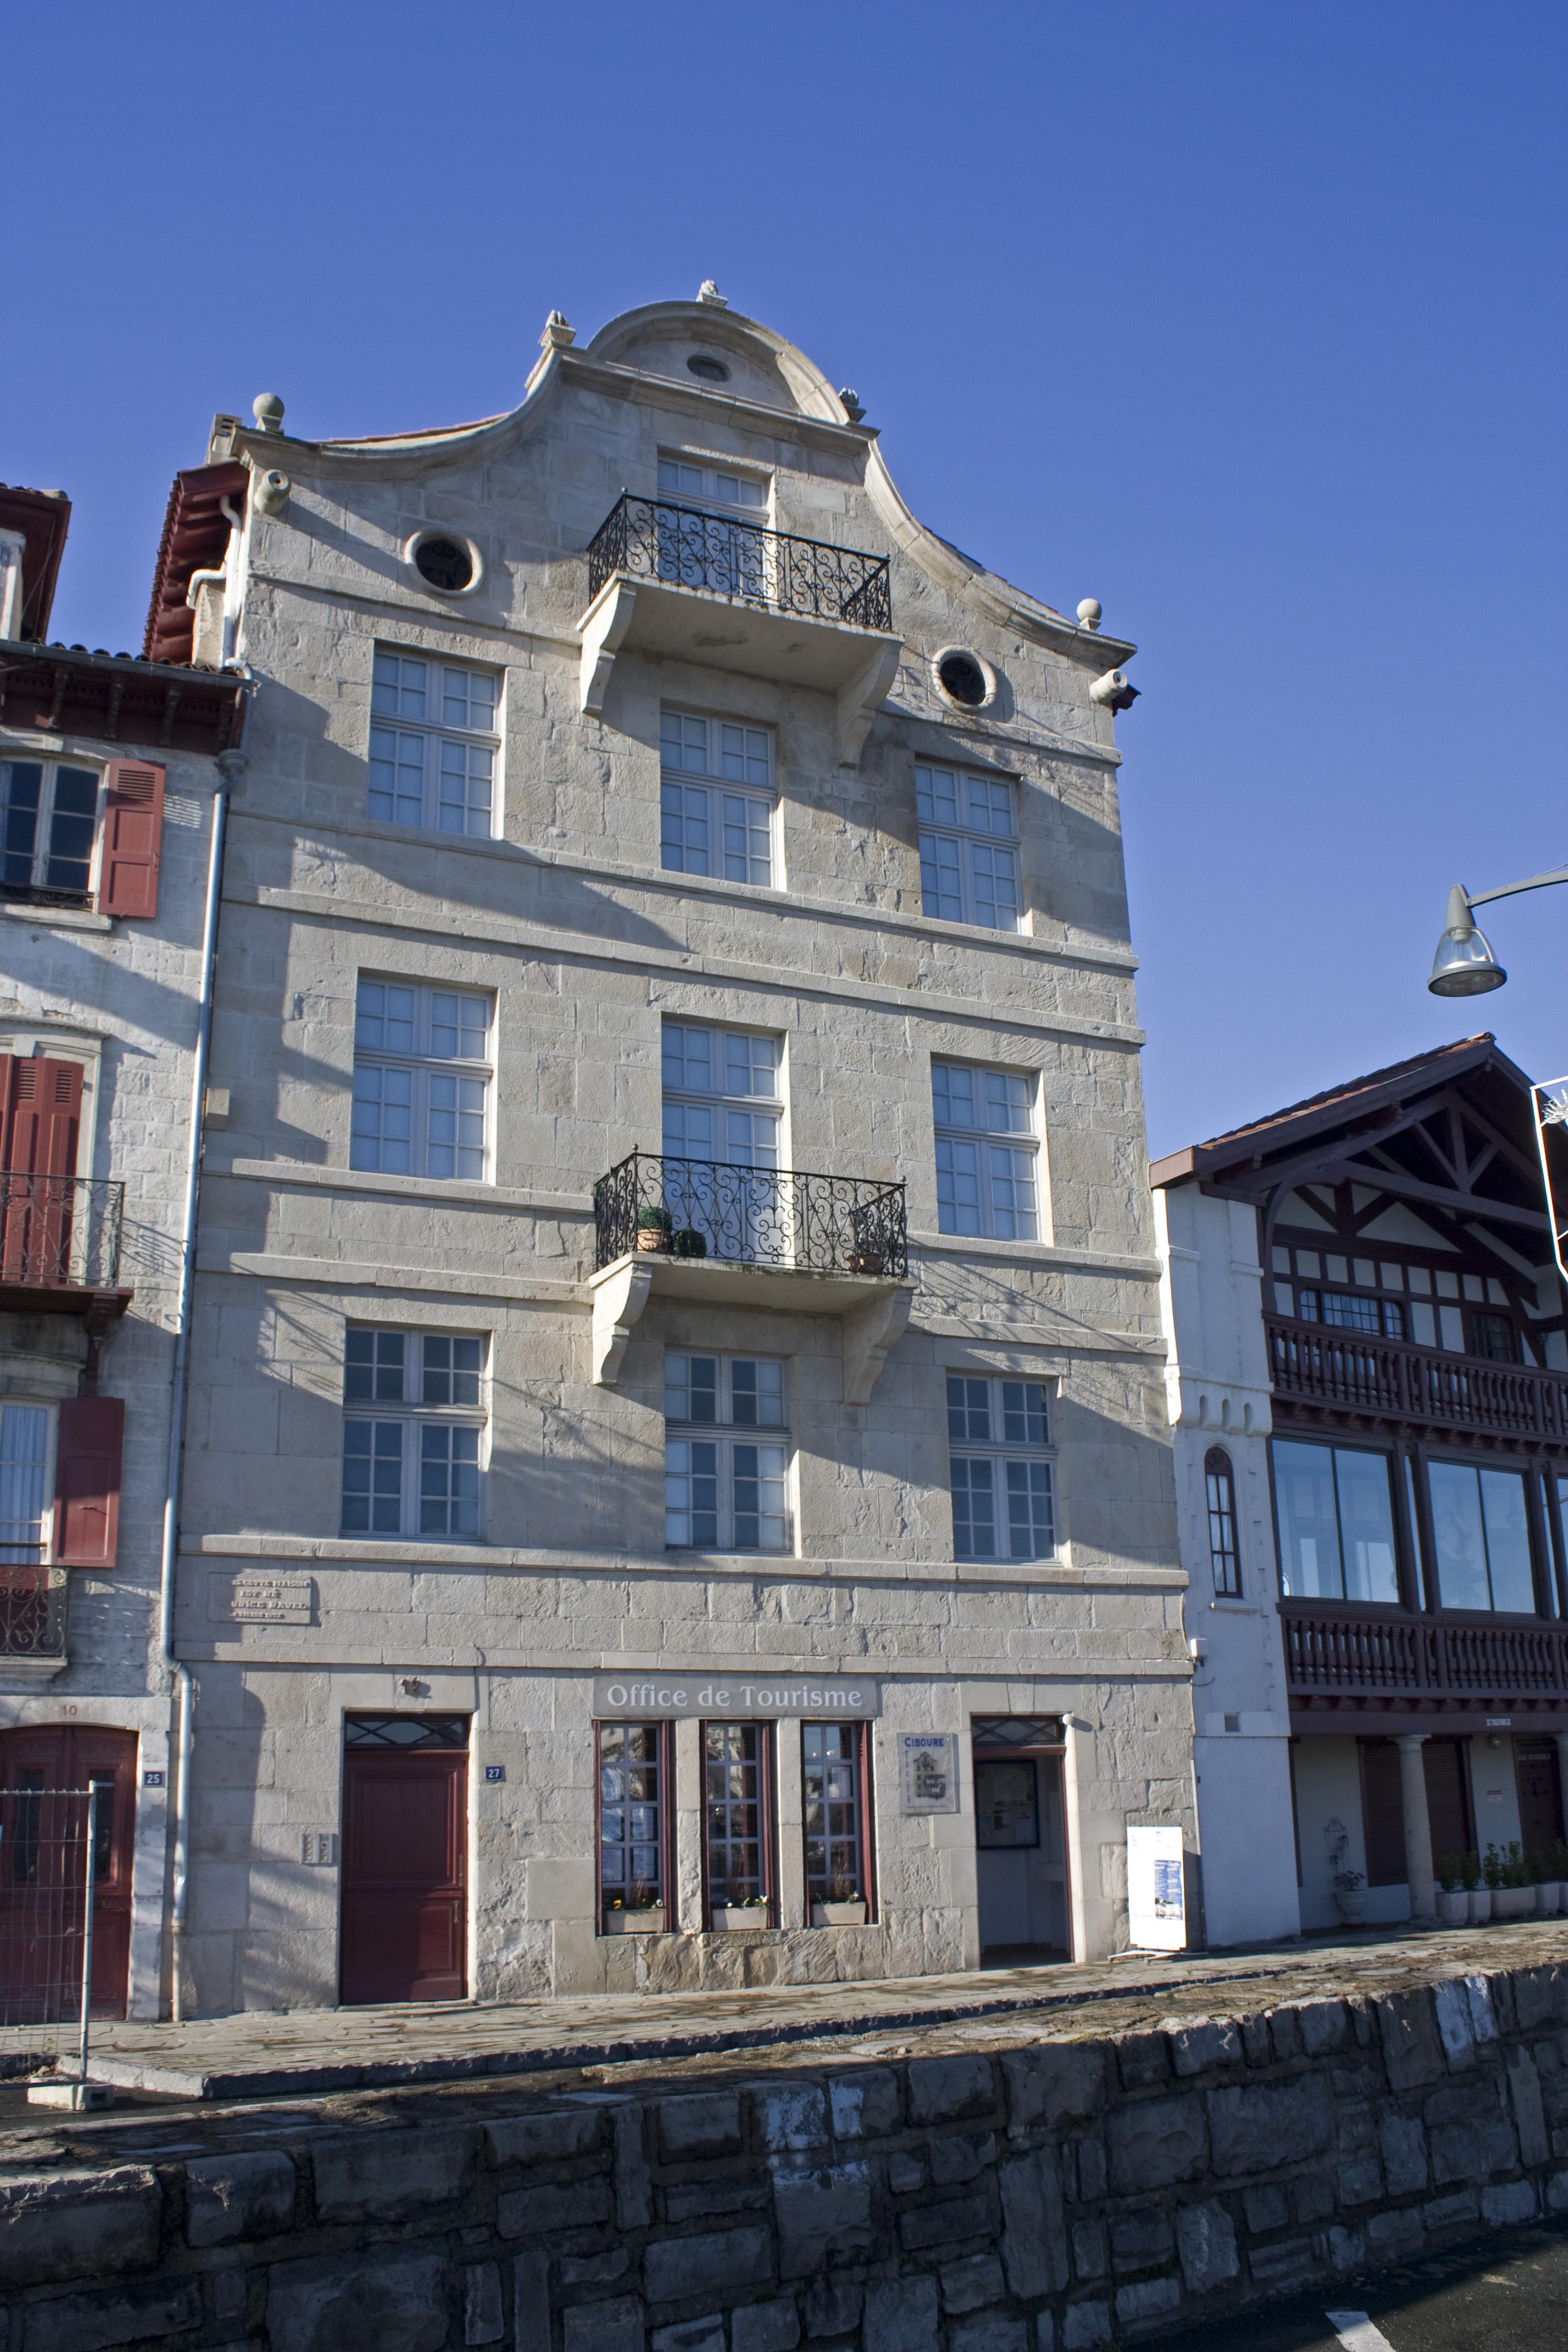 1000 ideas about ciboure on pinterest basque country biarritz and pyrenees - Office de tourisme de ciboure ...